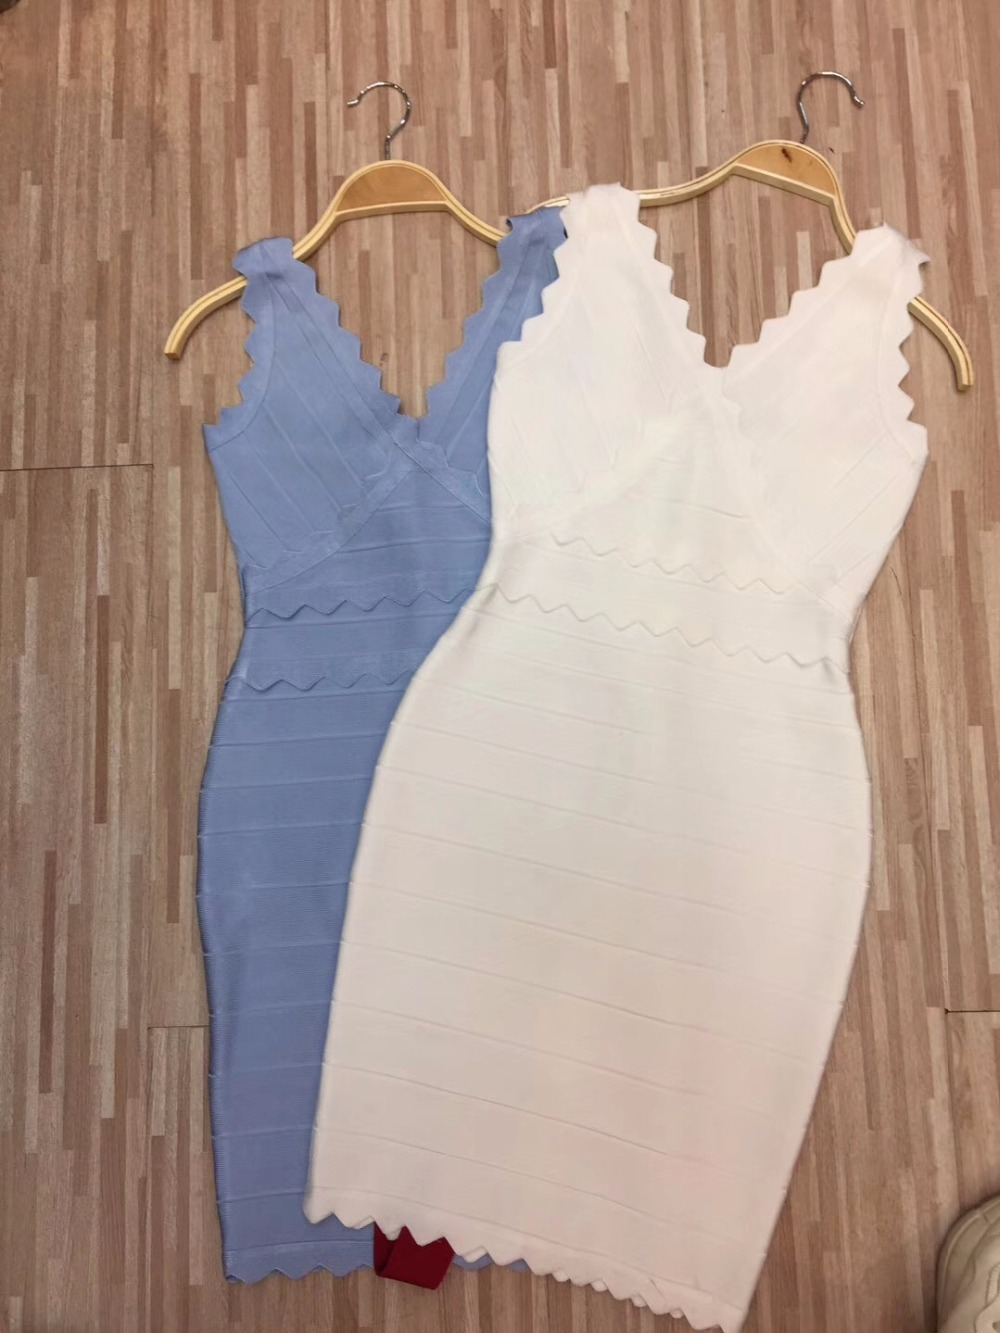 Clair blanc Partie Dames Robe Évider Rayonne Bleu Mini 2018 Blanc Sexy Pu Beige Ciel Bandage Femmes CqTtwZBq